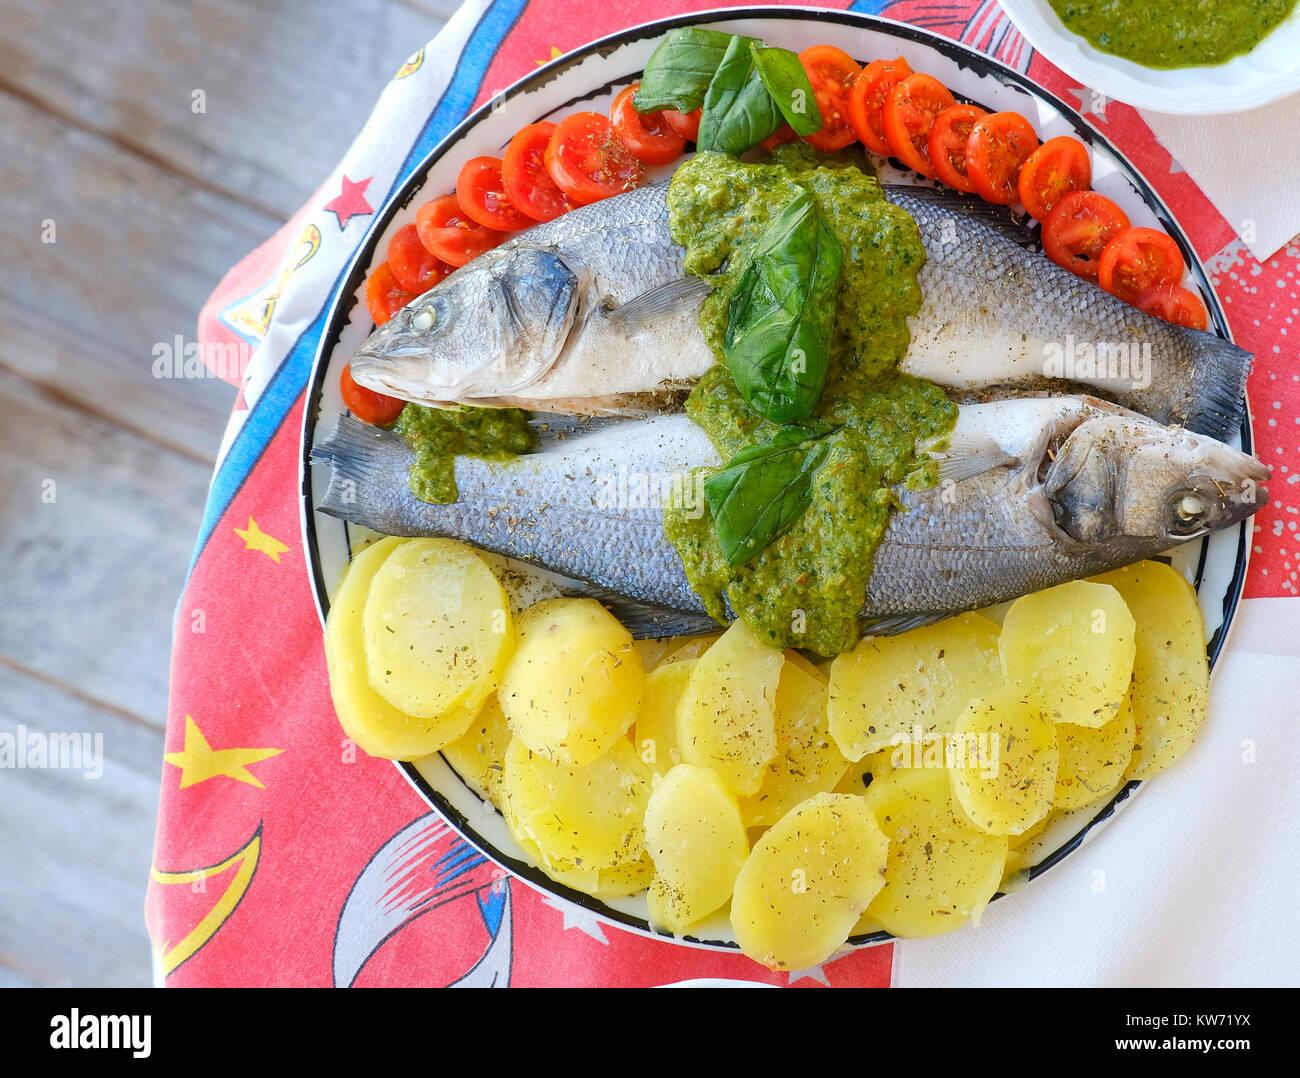 european sea bass branzino steaming basil sauce recipe high angle up view - Stock Image